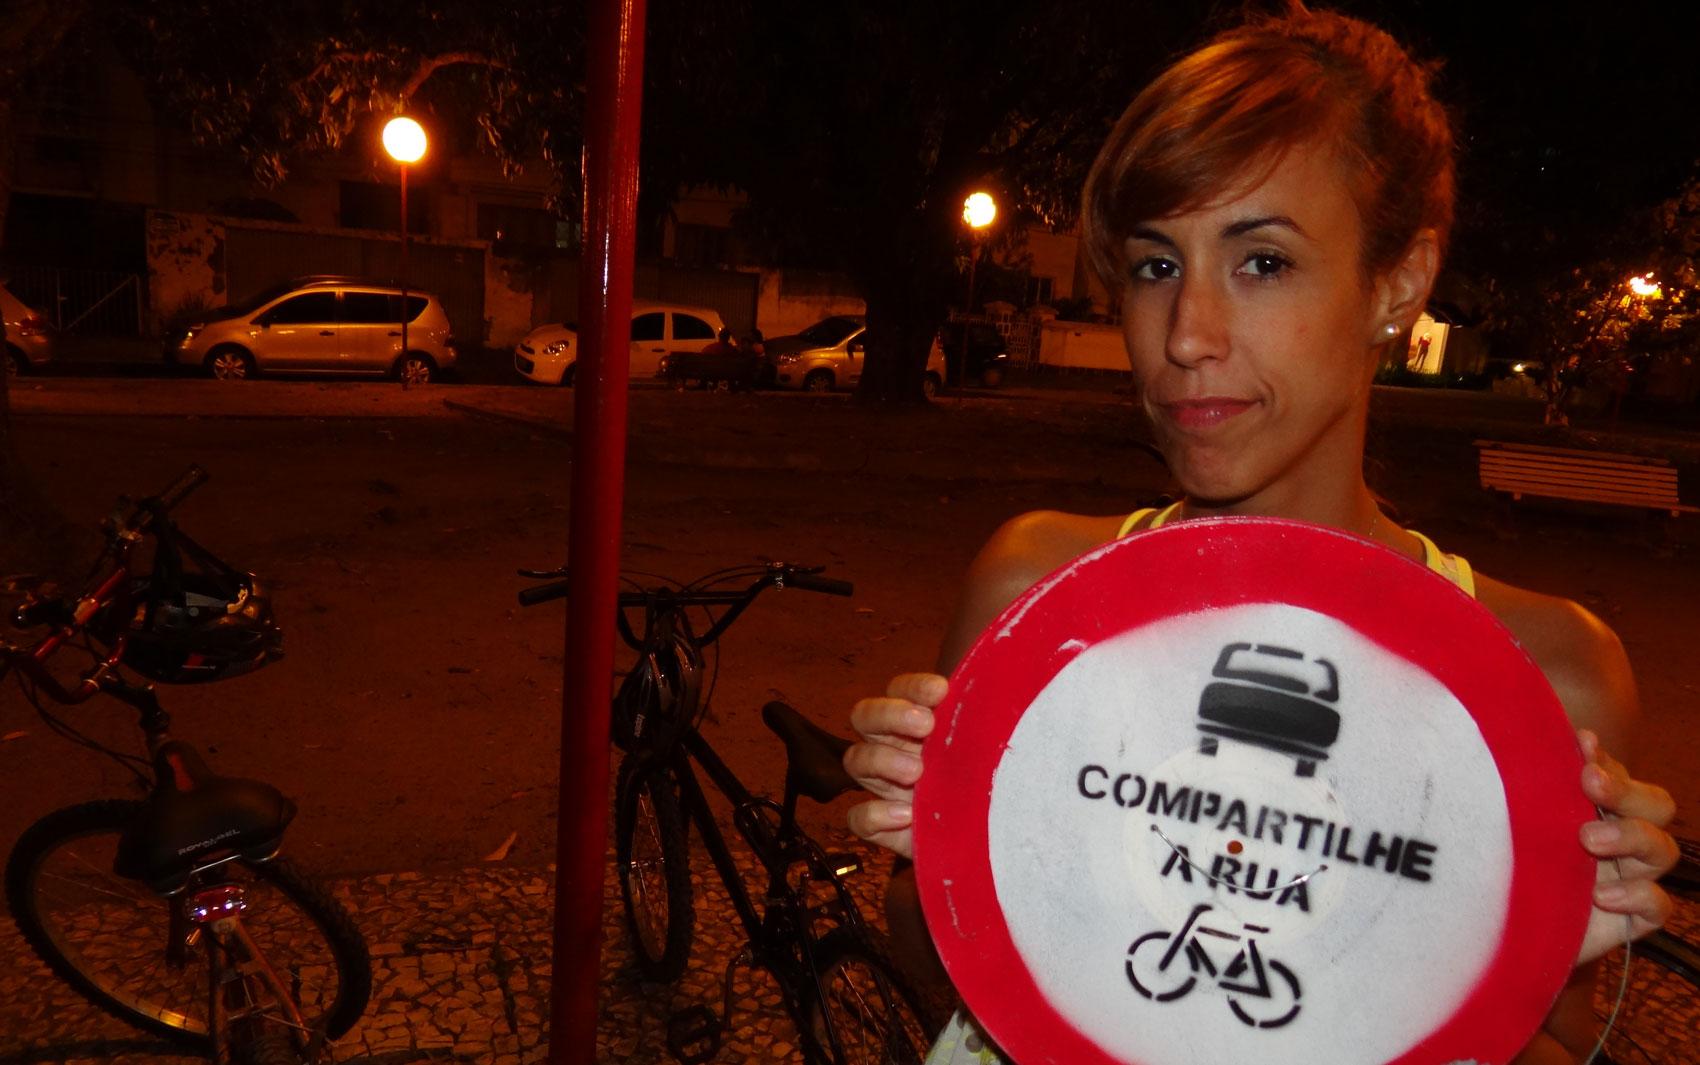 Carioca Rosa Antunes disse que vai levar ideia para sua cidade